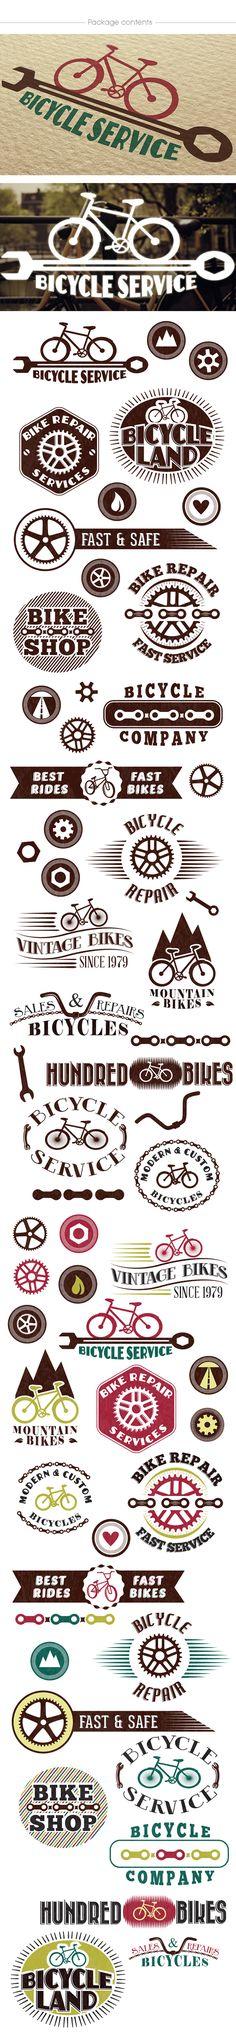 logozilla2-logo-builder-bicycle-shop-large